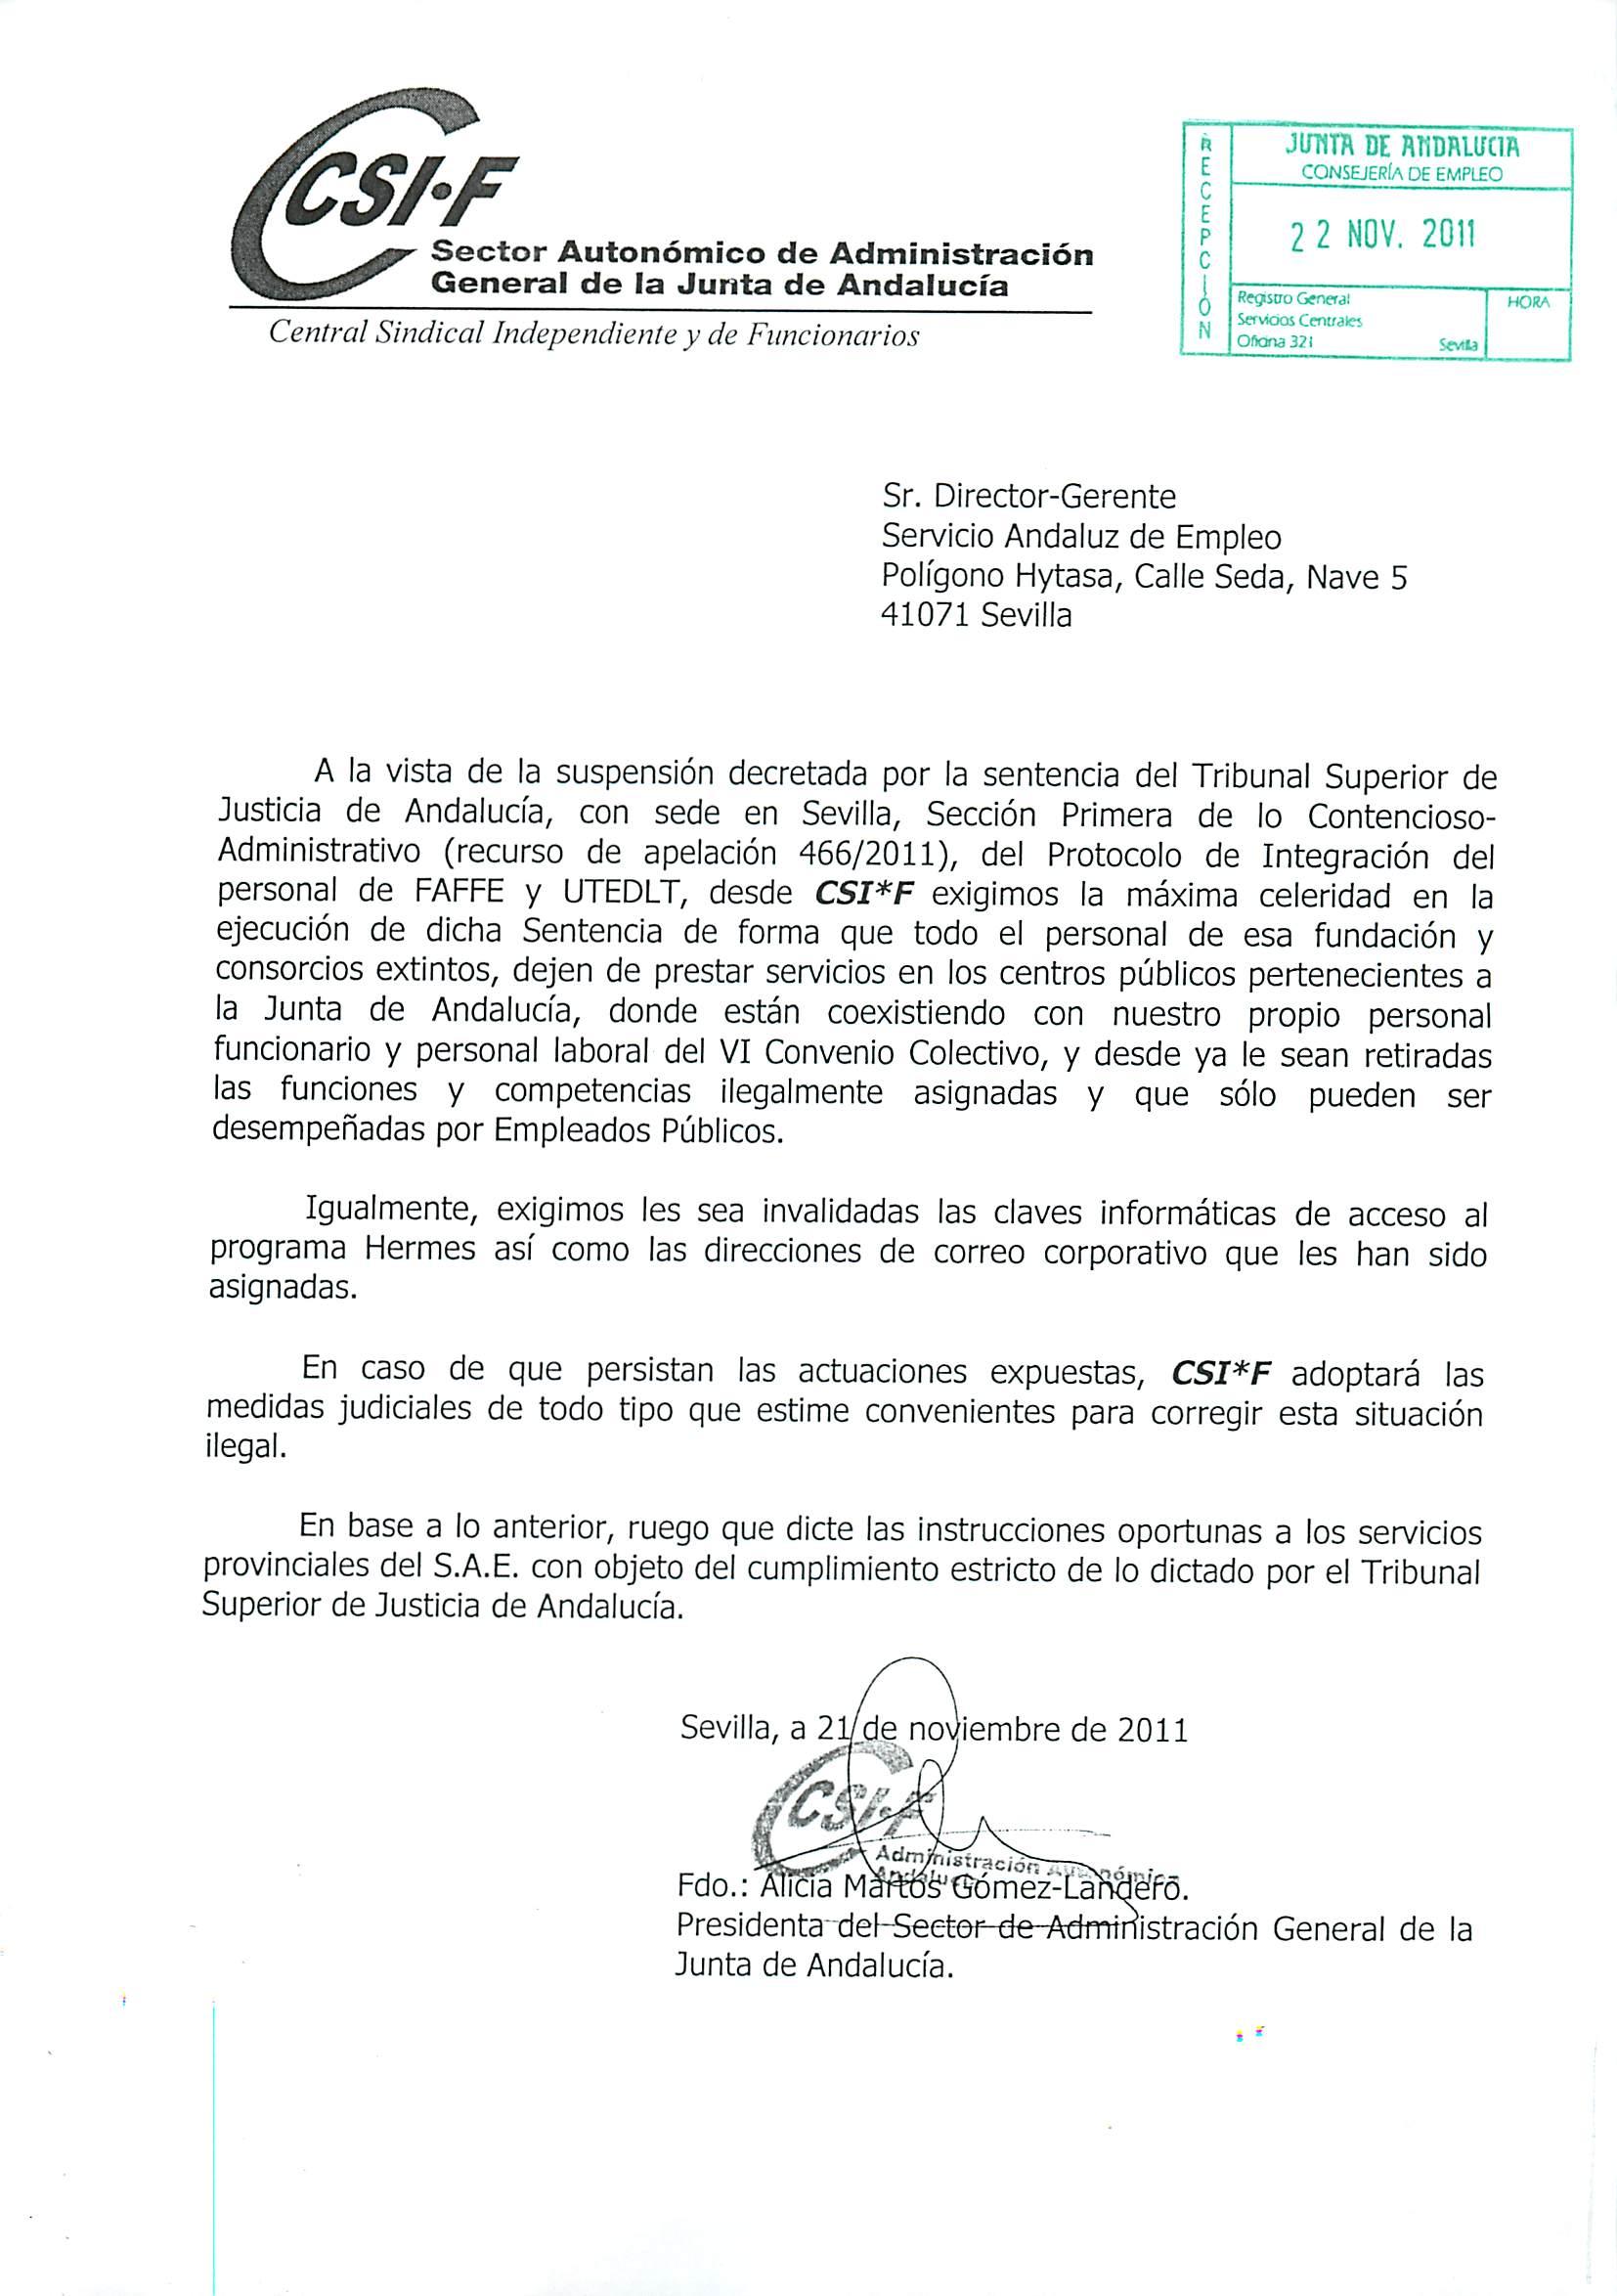 Correo corporativo junta de andalucia